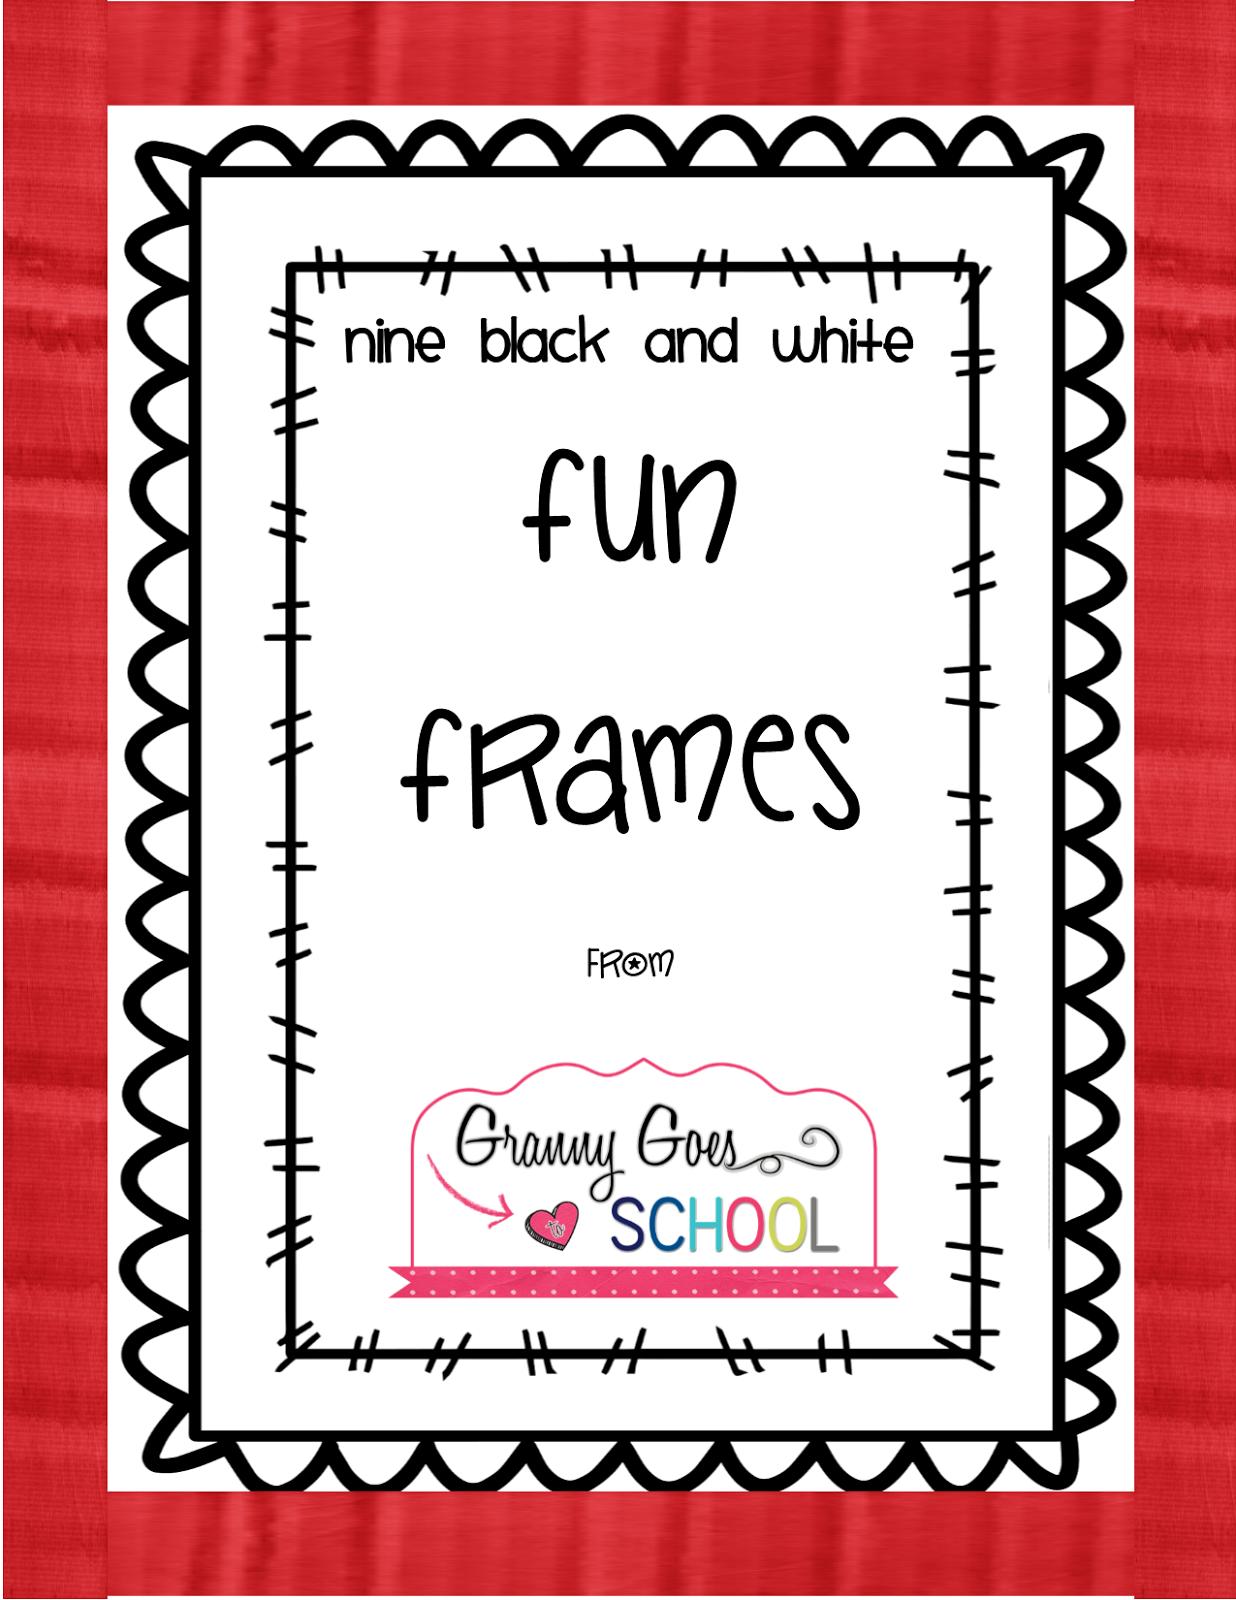 FREE Fun Frames - clipart mini set | Clip Art Craze | Pinterest ...